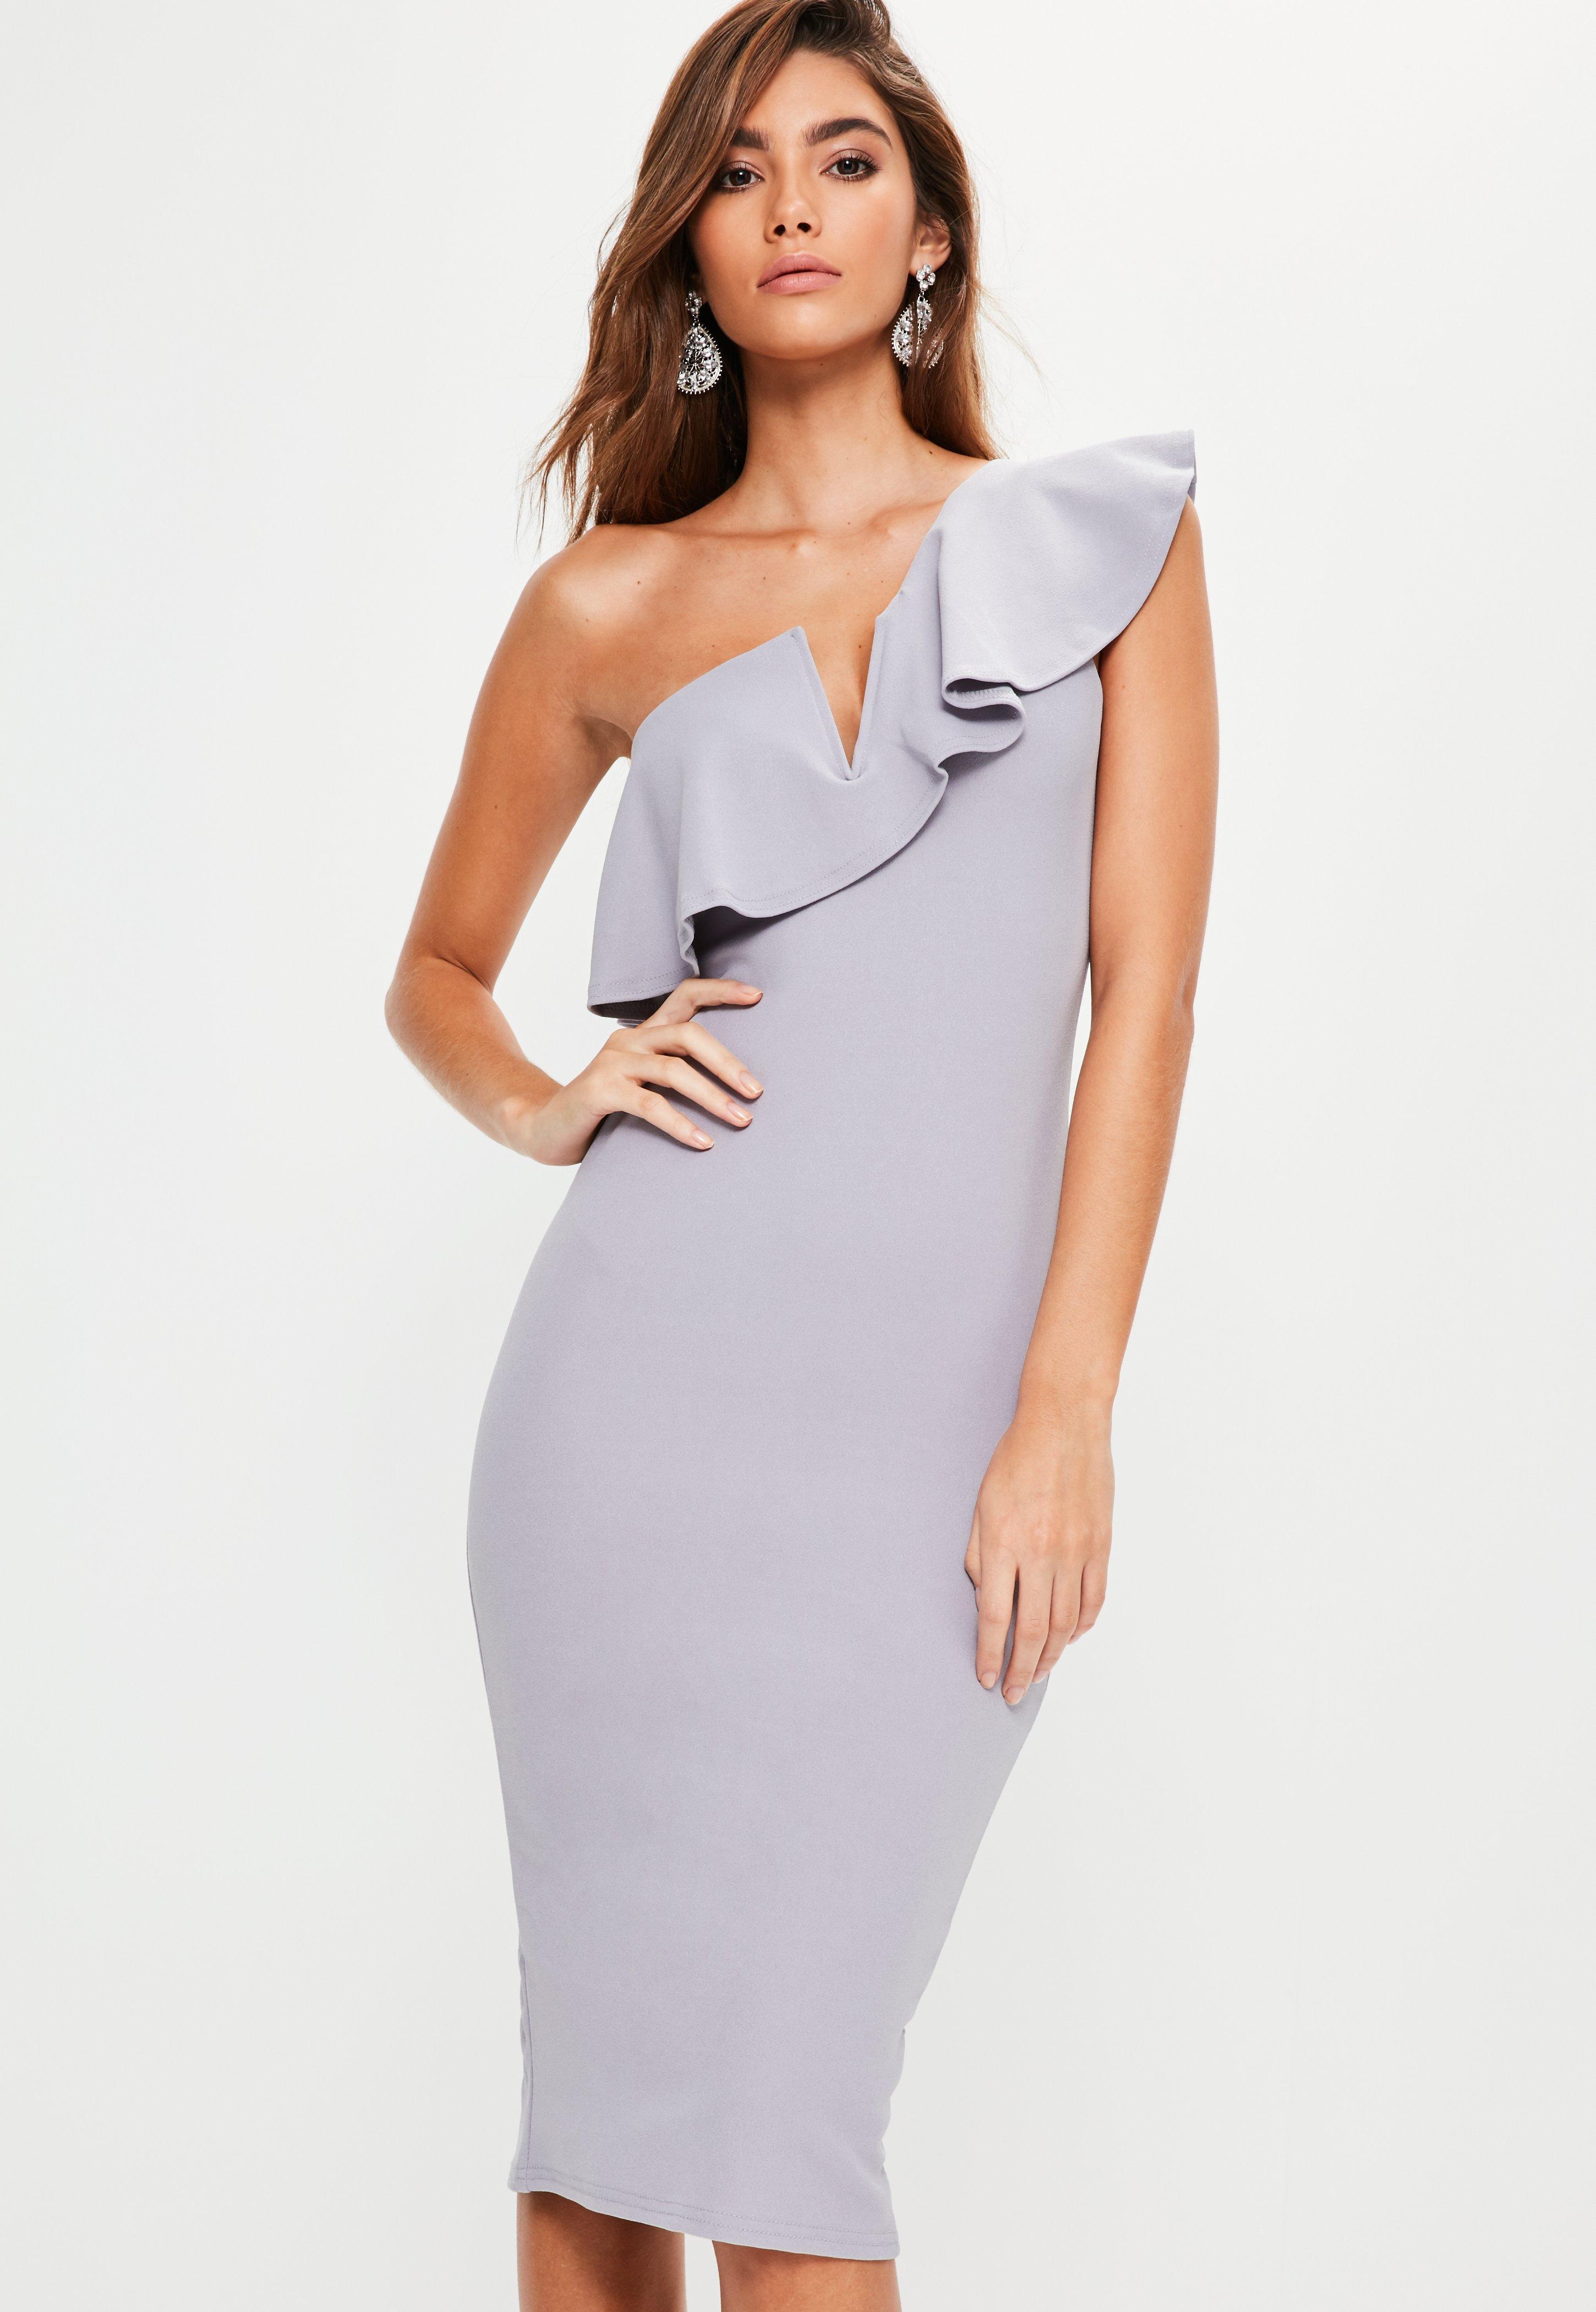 Wedding One Shoulder Dress grey one shoulder frill midi dress missguided previous next